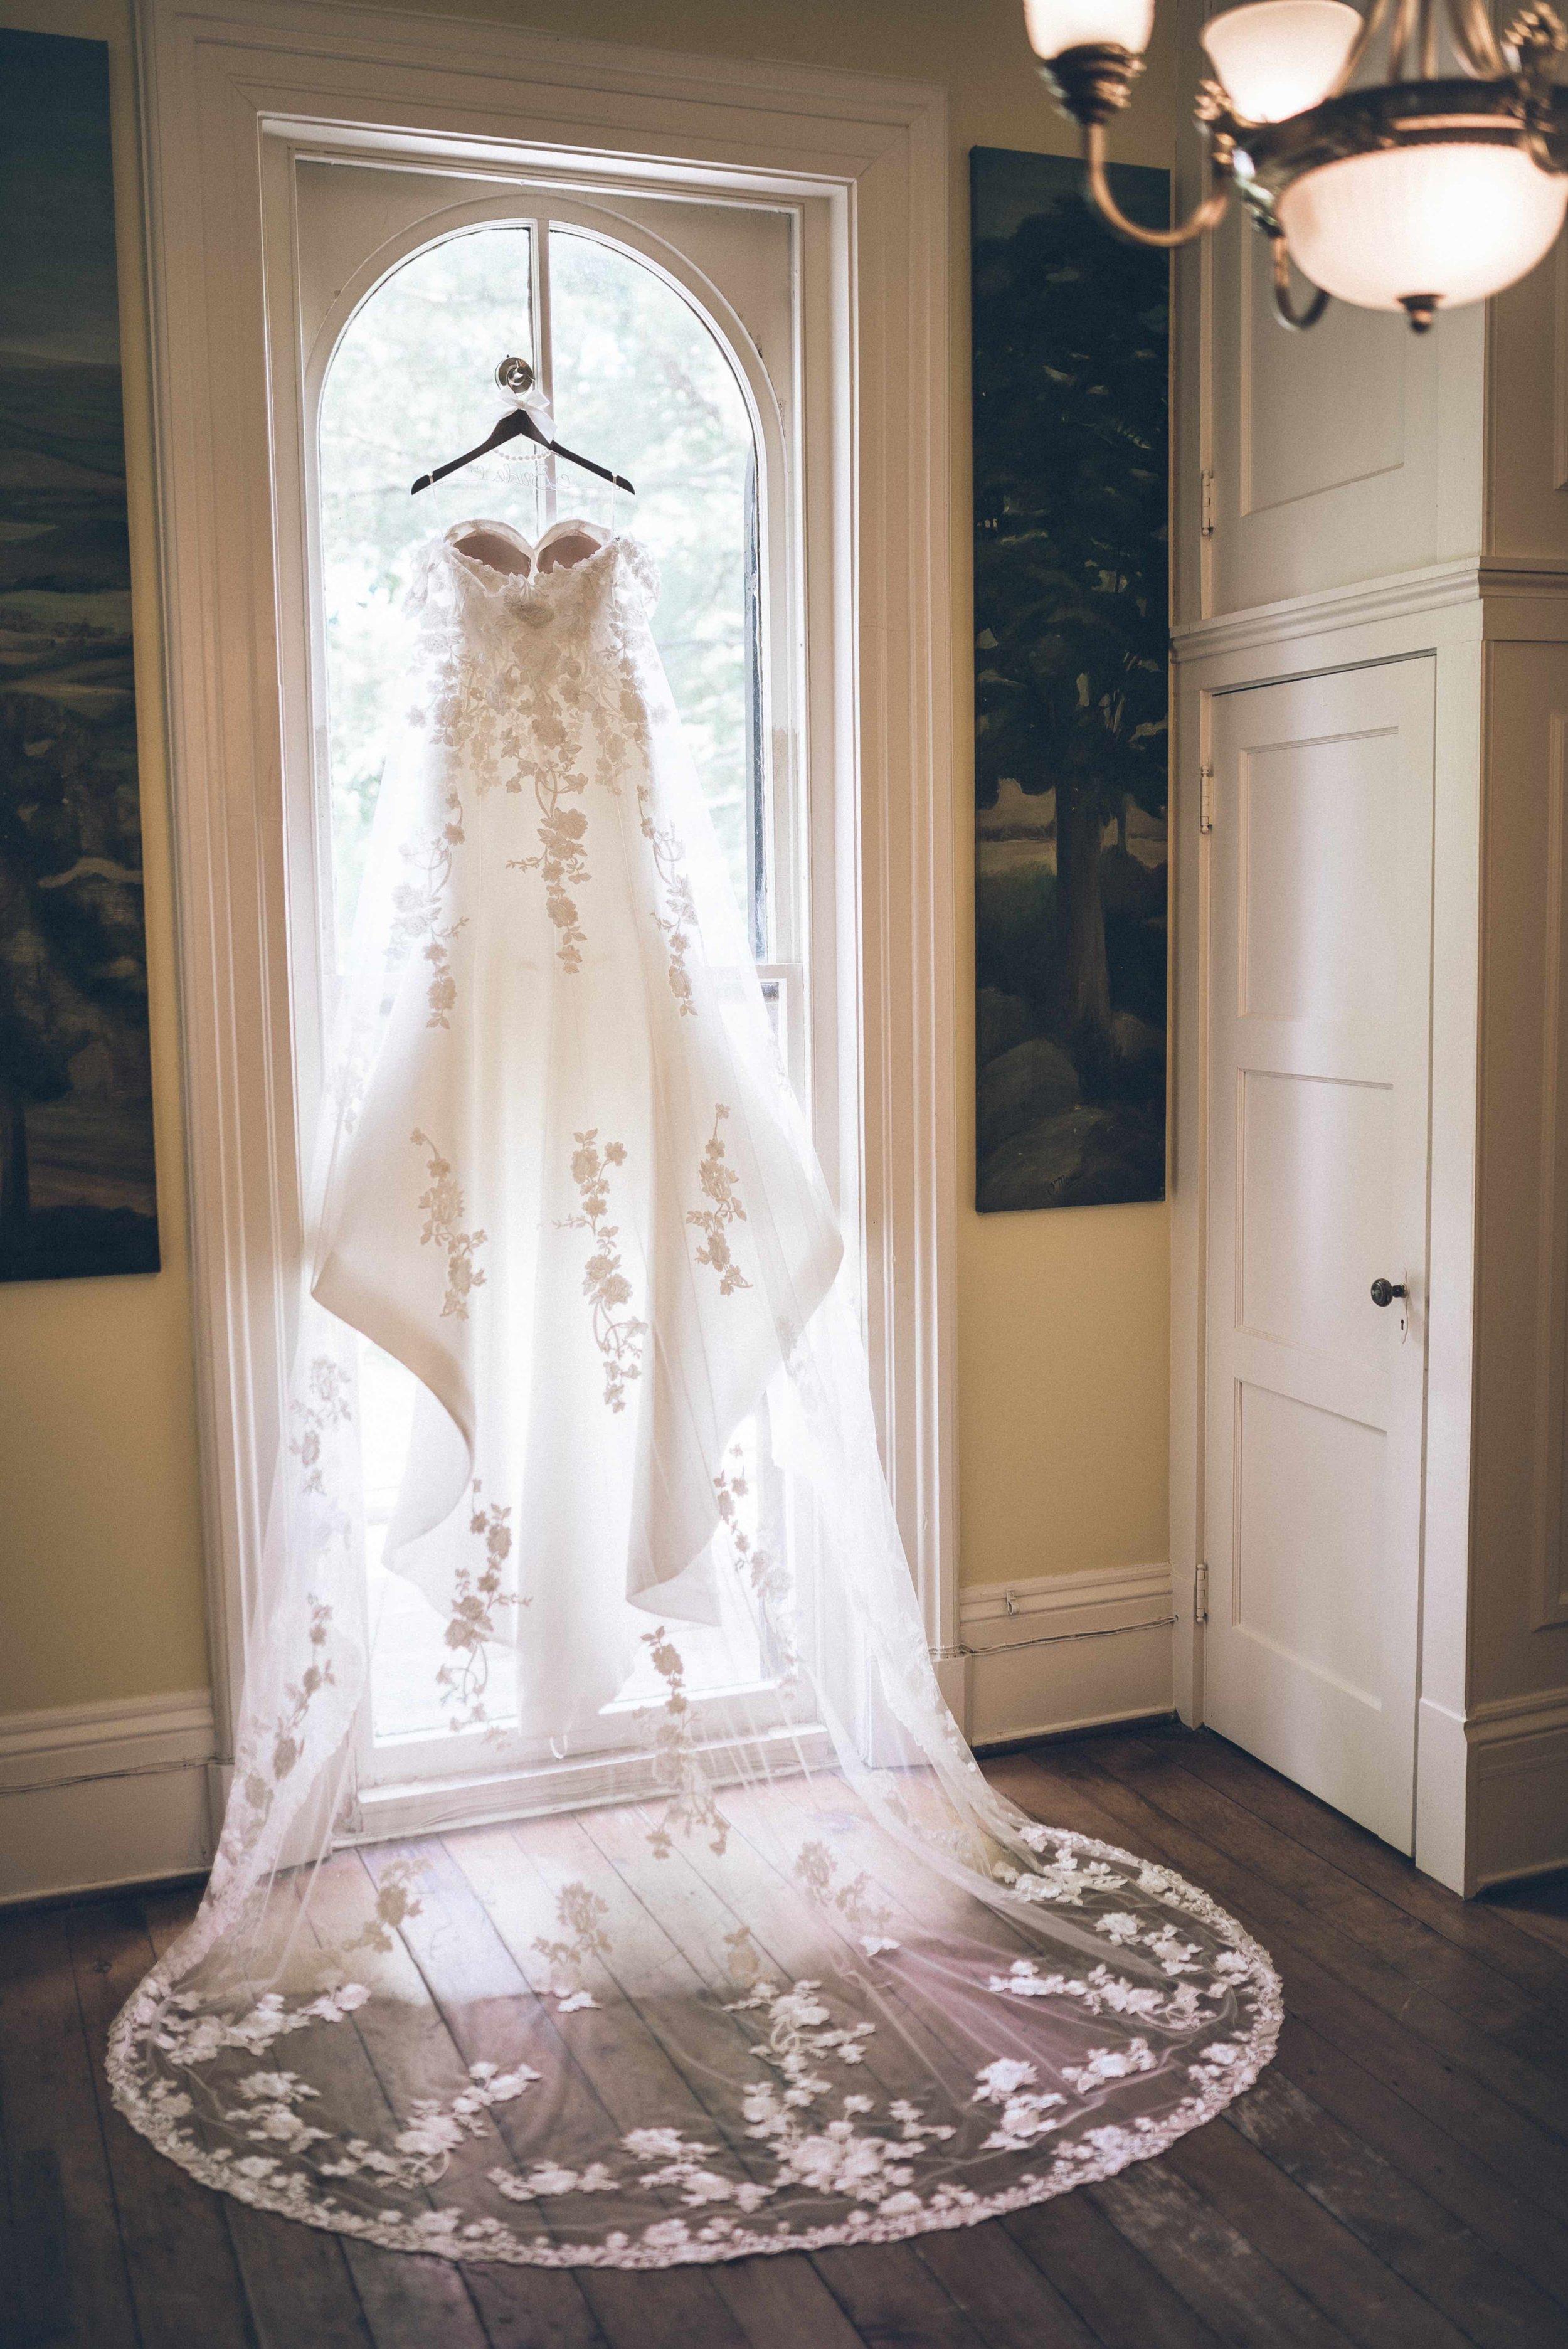 DetailsNashville-Laura+Patrick-WeddingDay-014.jpeg